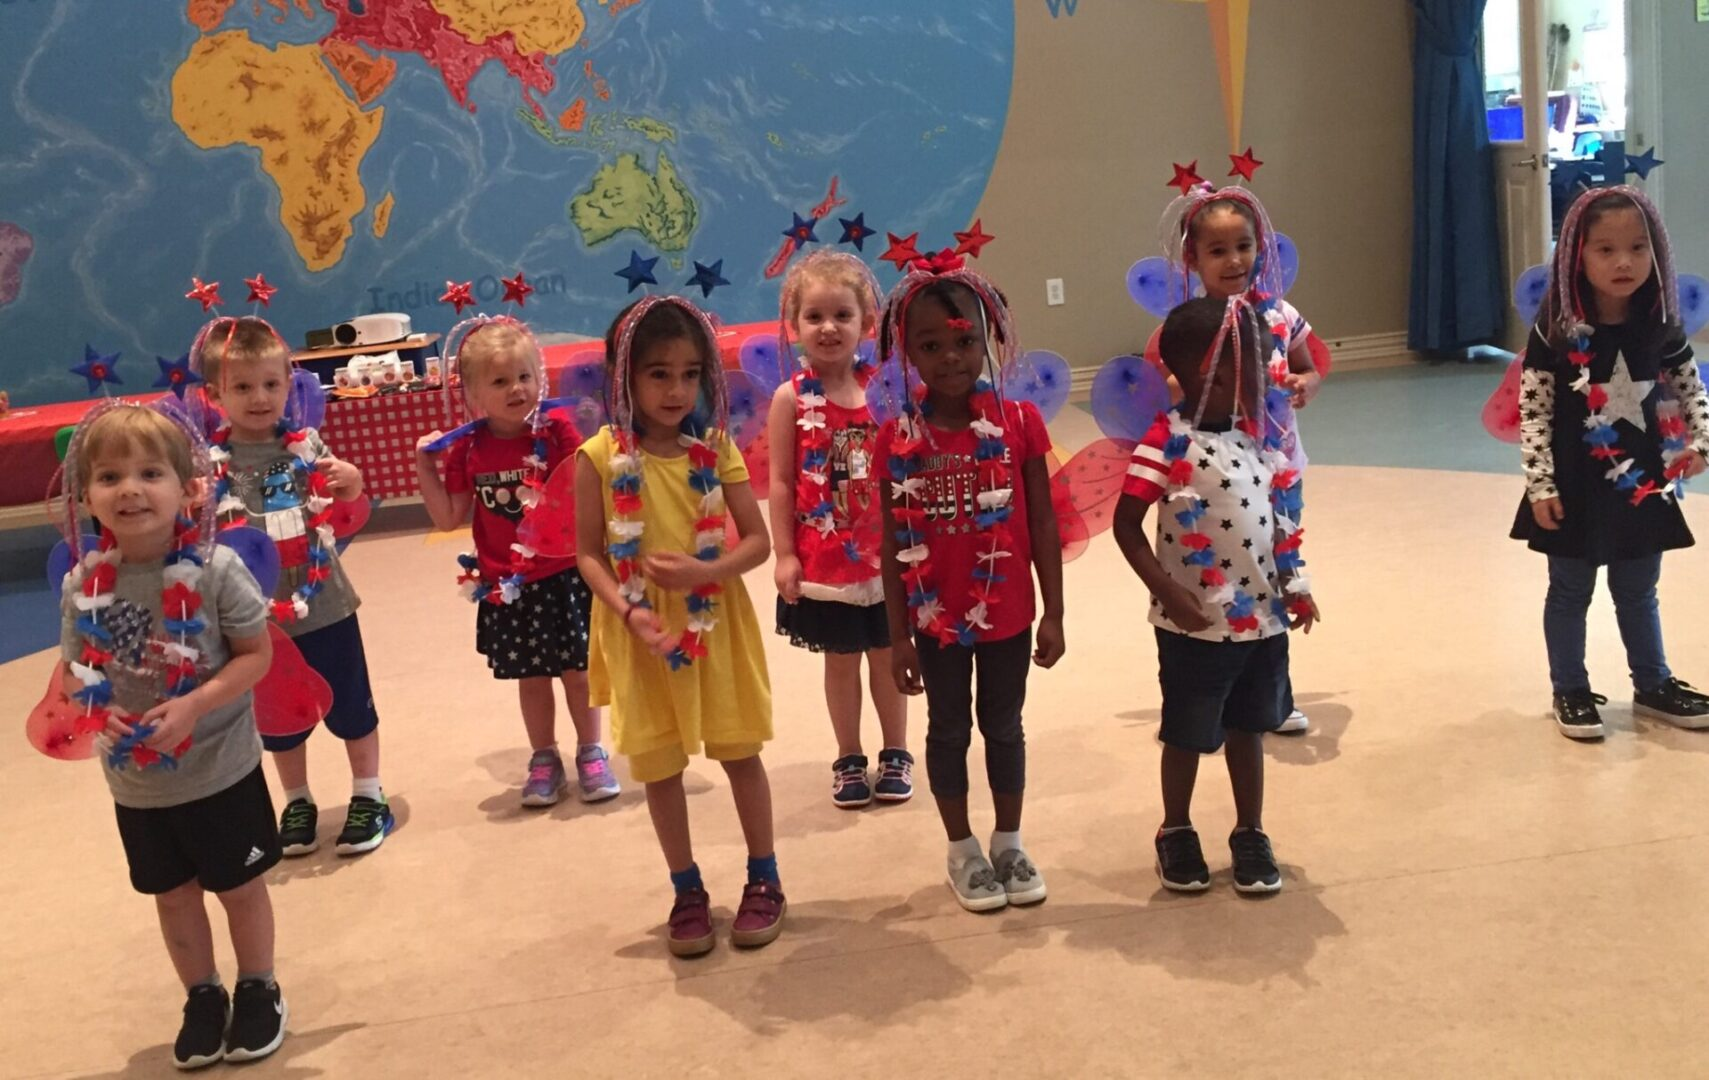 Children wearing party accessories